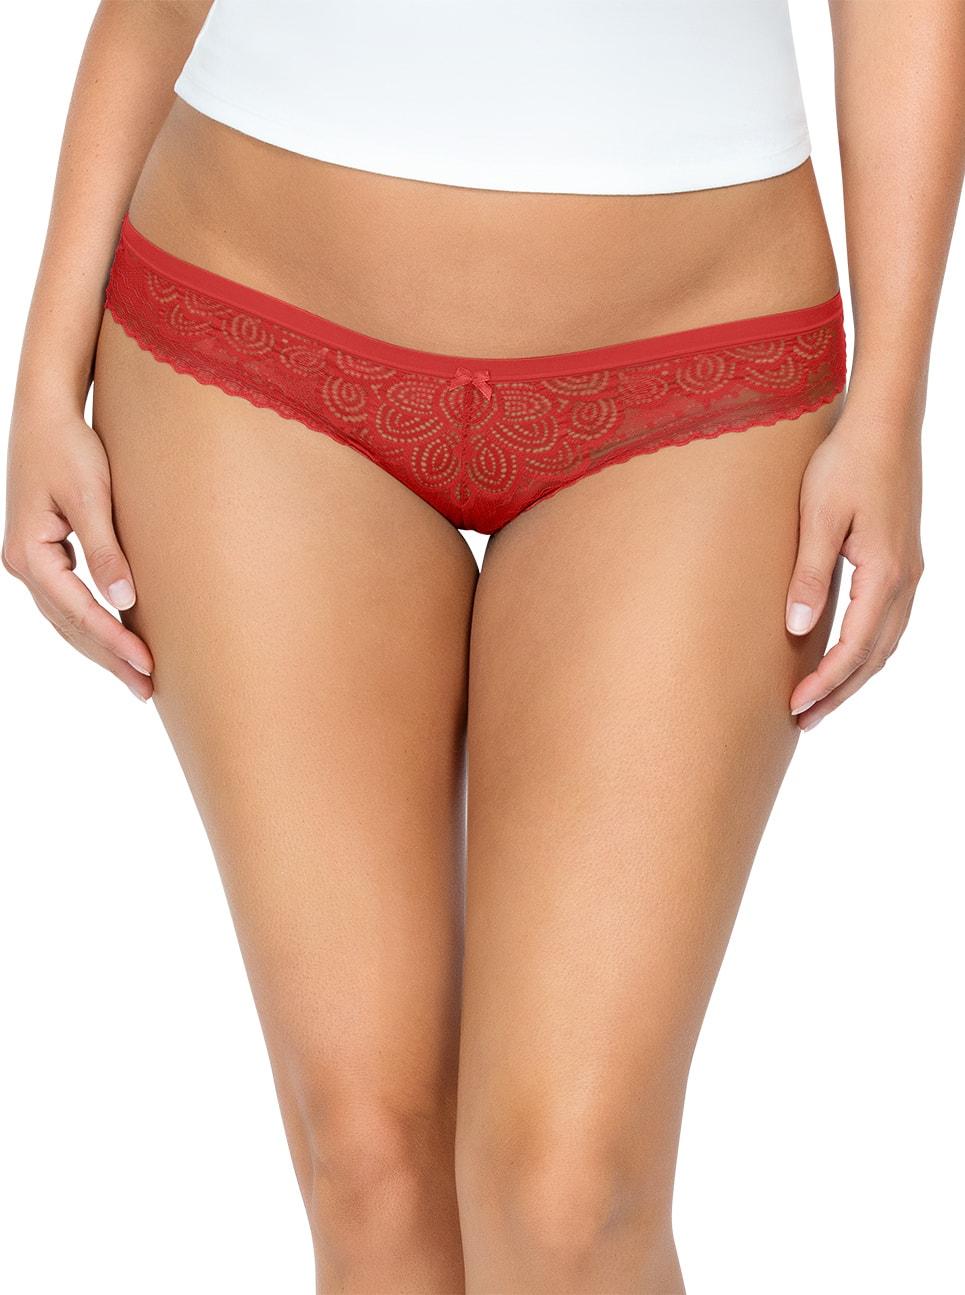 PARFAIT ParfaitPanty SoGlam BikiniPP302 Scarlette Front close - Parfait Panty So Glam Bikini - Scarlette - PP302